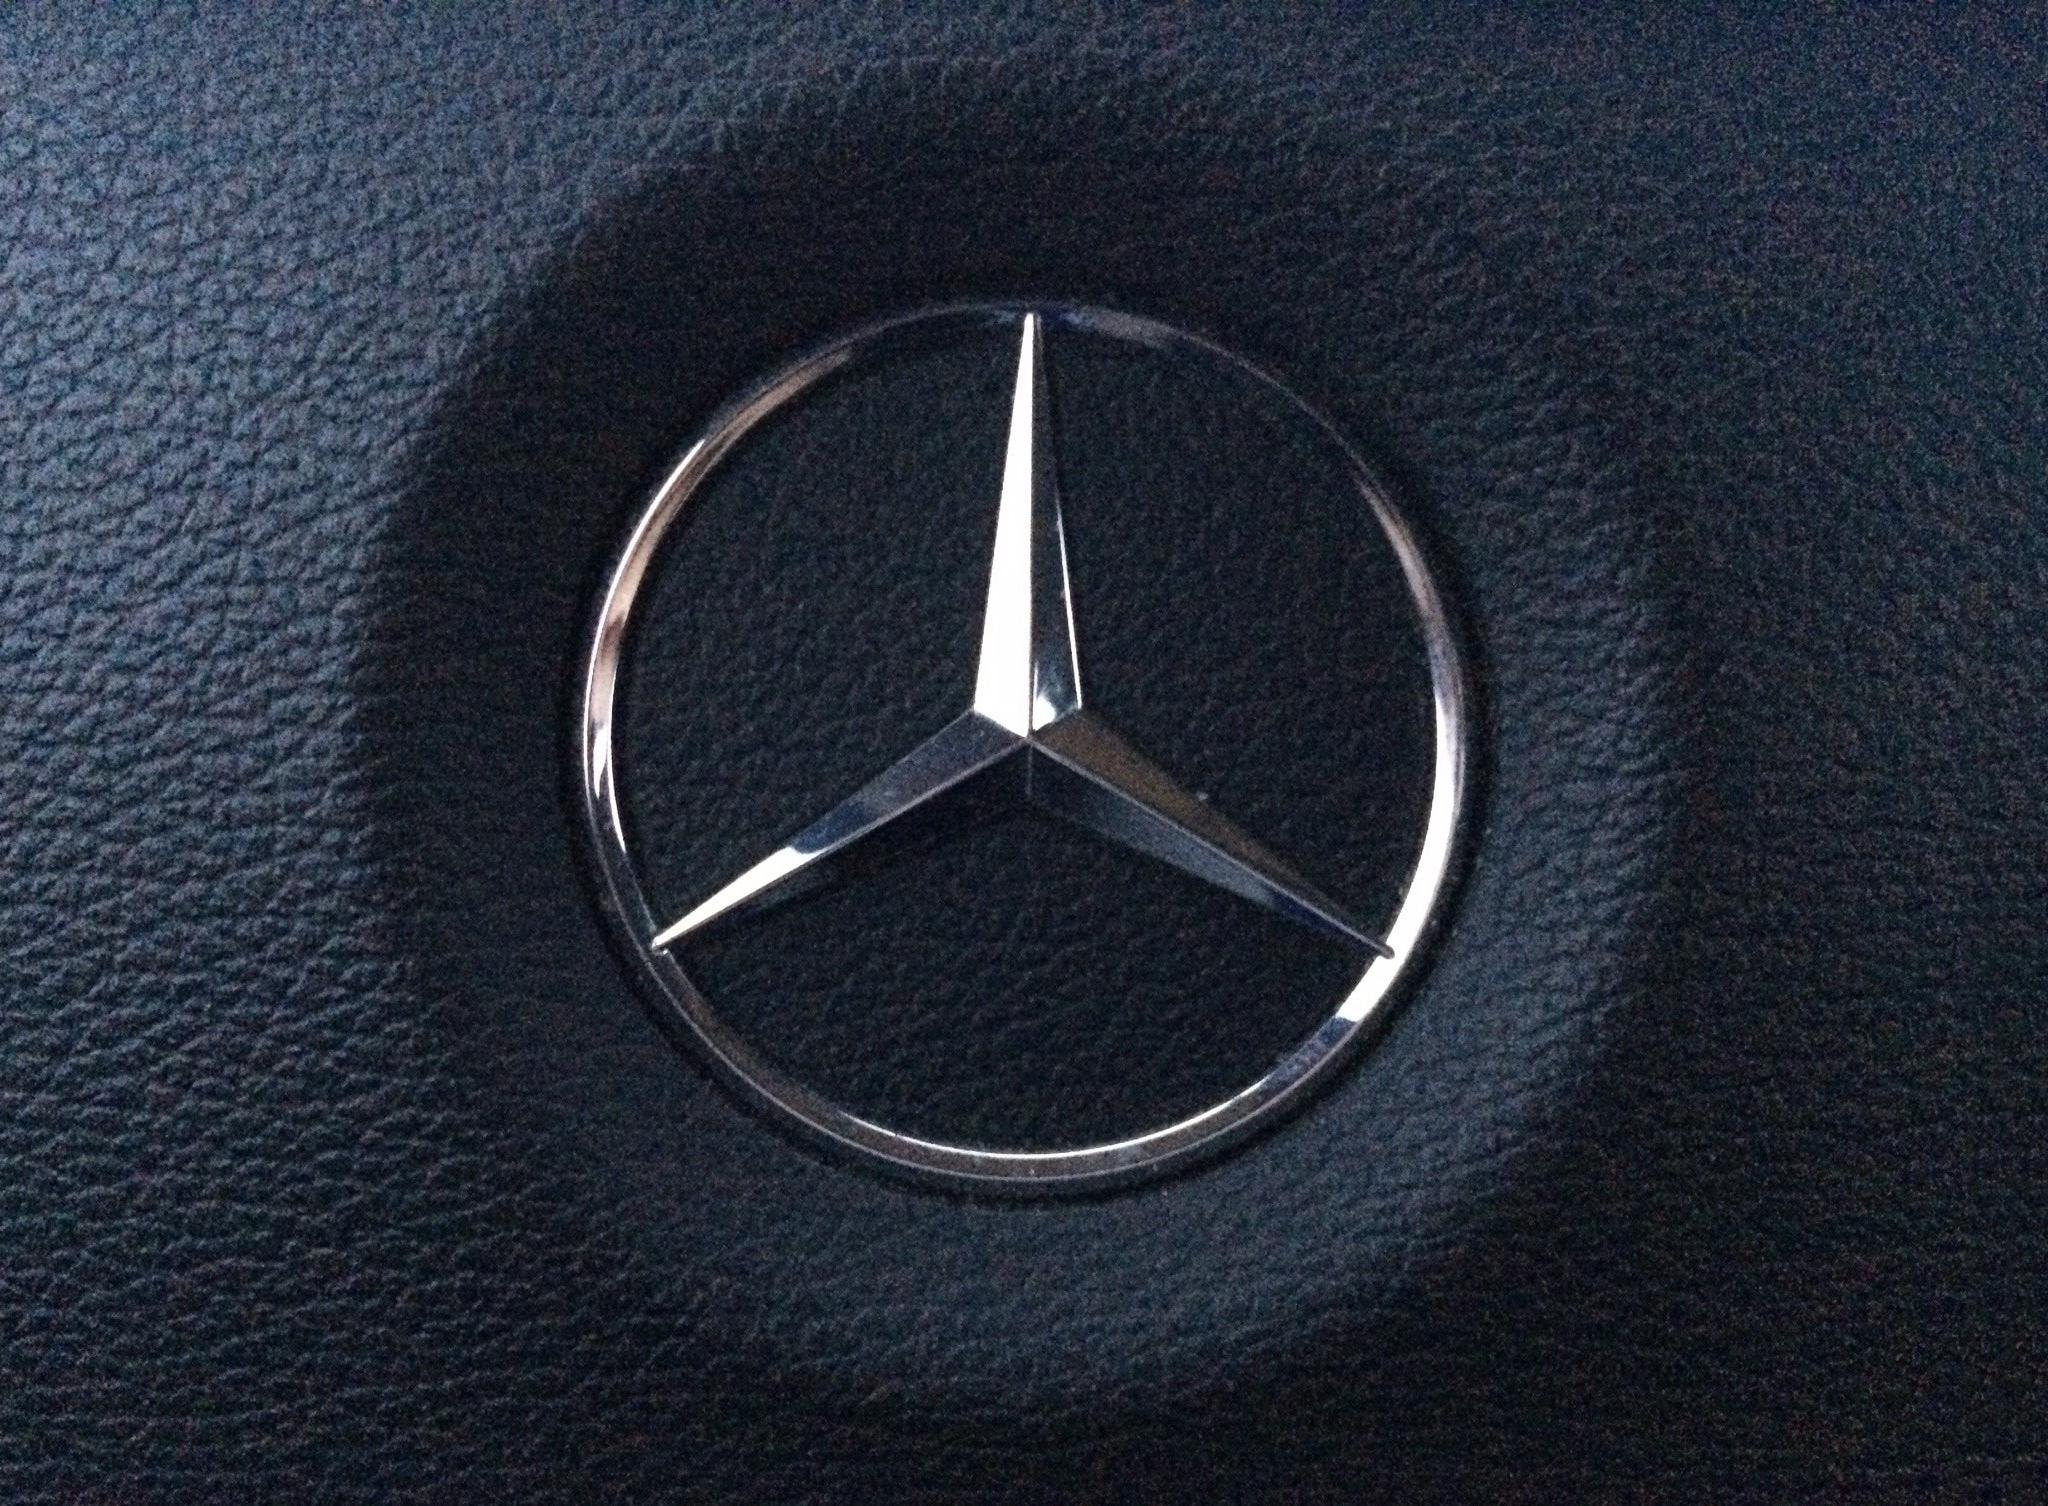 Mercedes Benz, Stockport